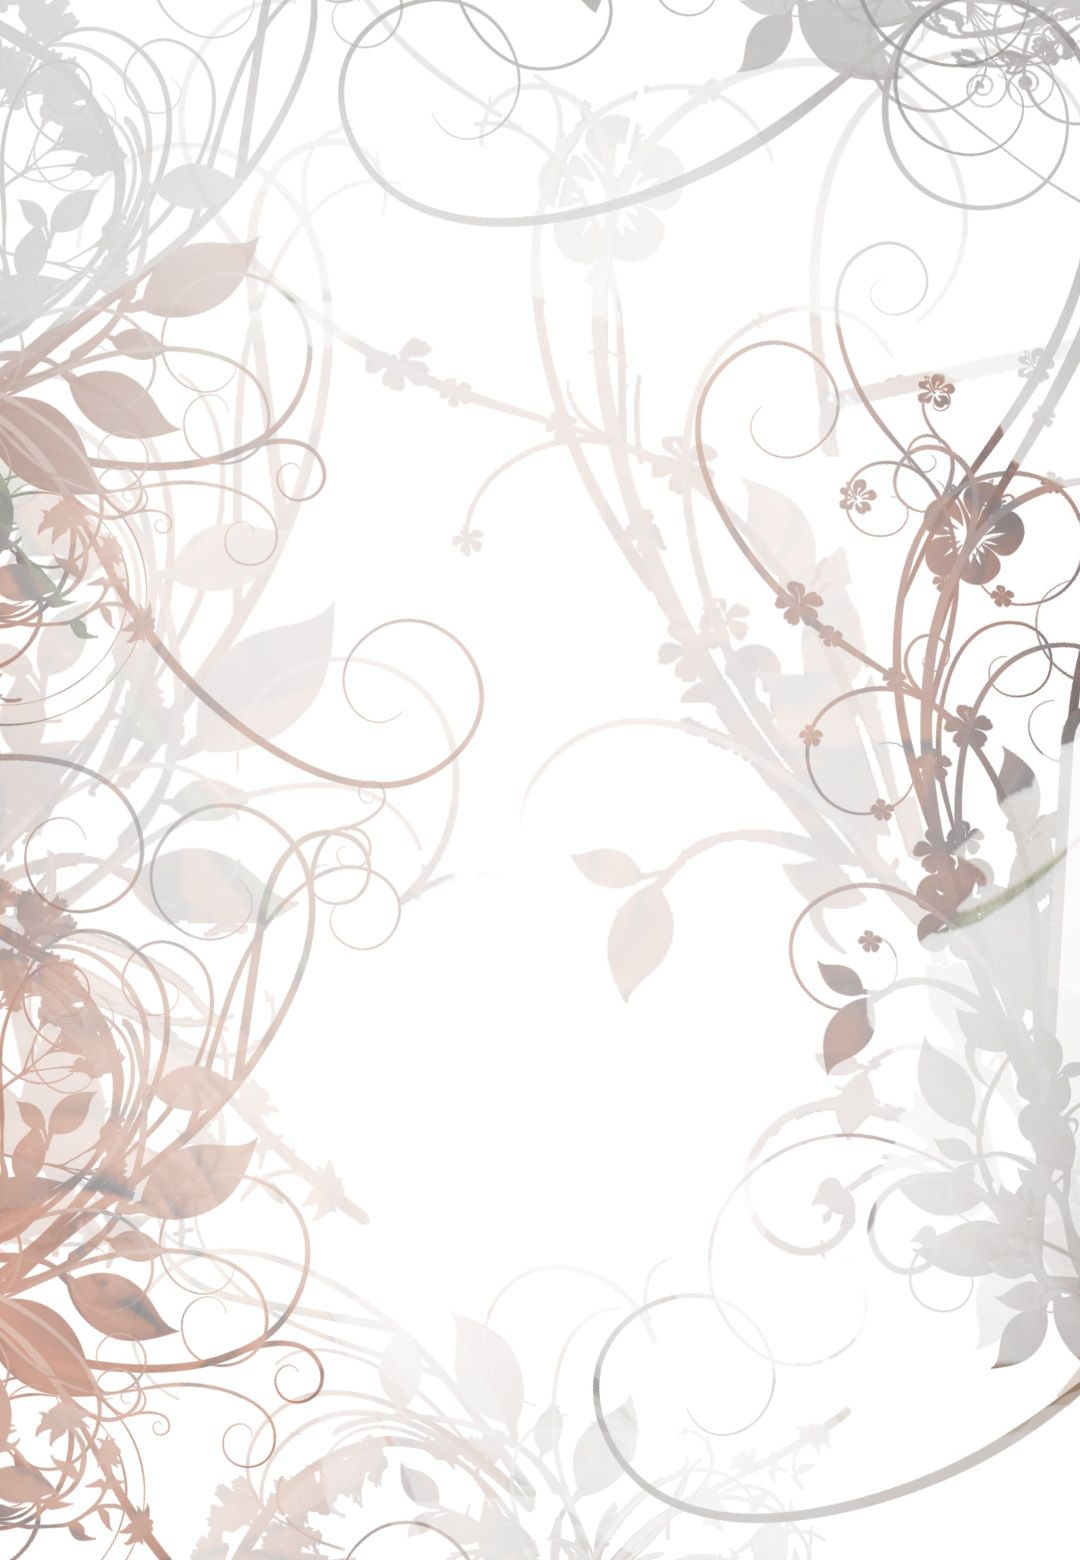 Free Printable Floral Bridal Shower Invitation | Possible Within Blank Bridal Shower Invitations Templates